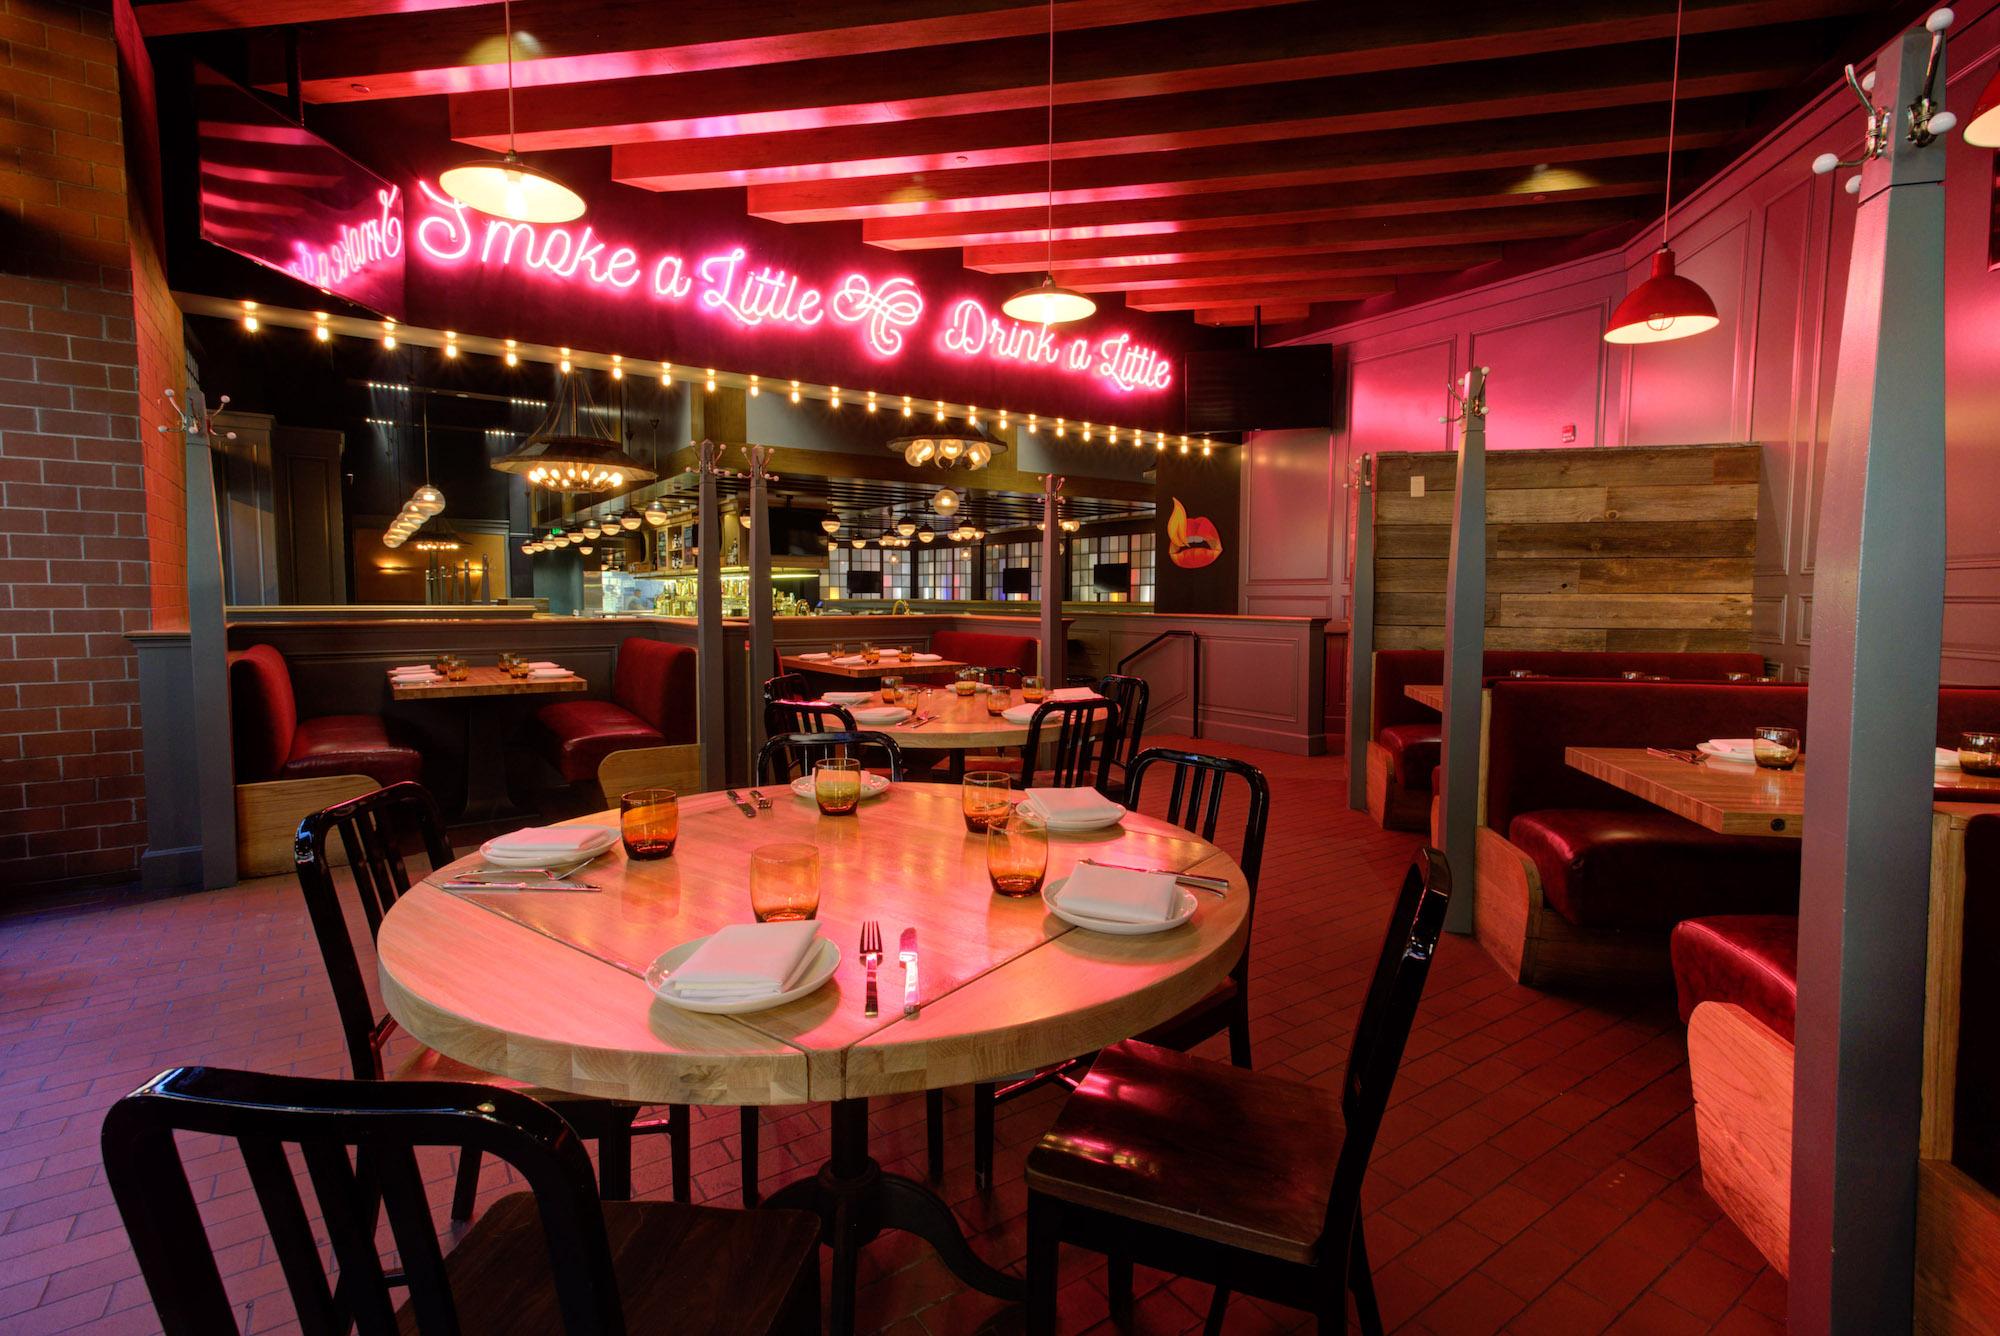 The dining room at International Smoke